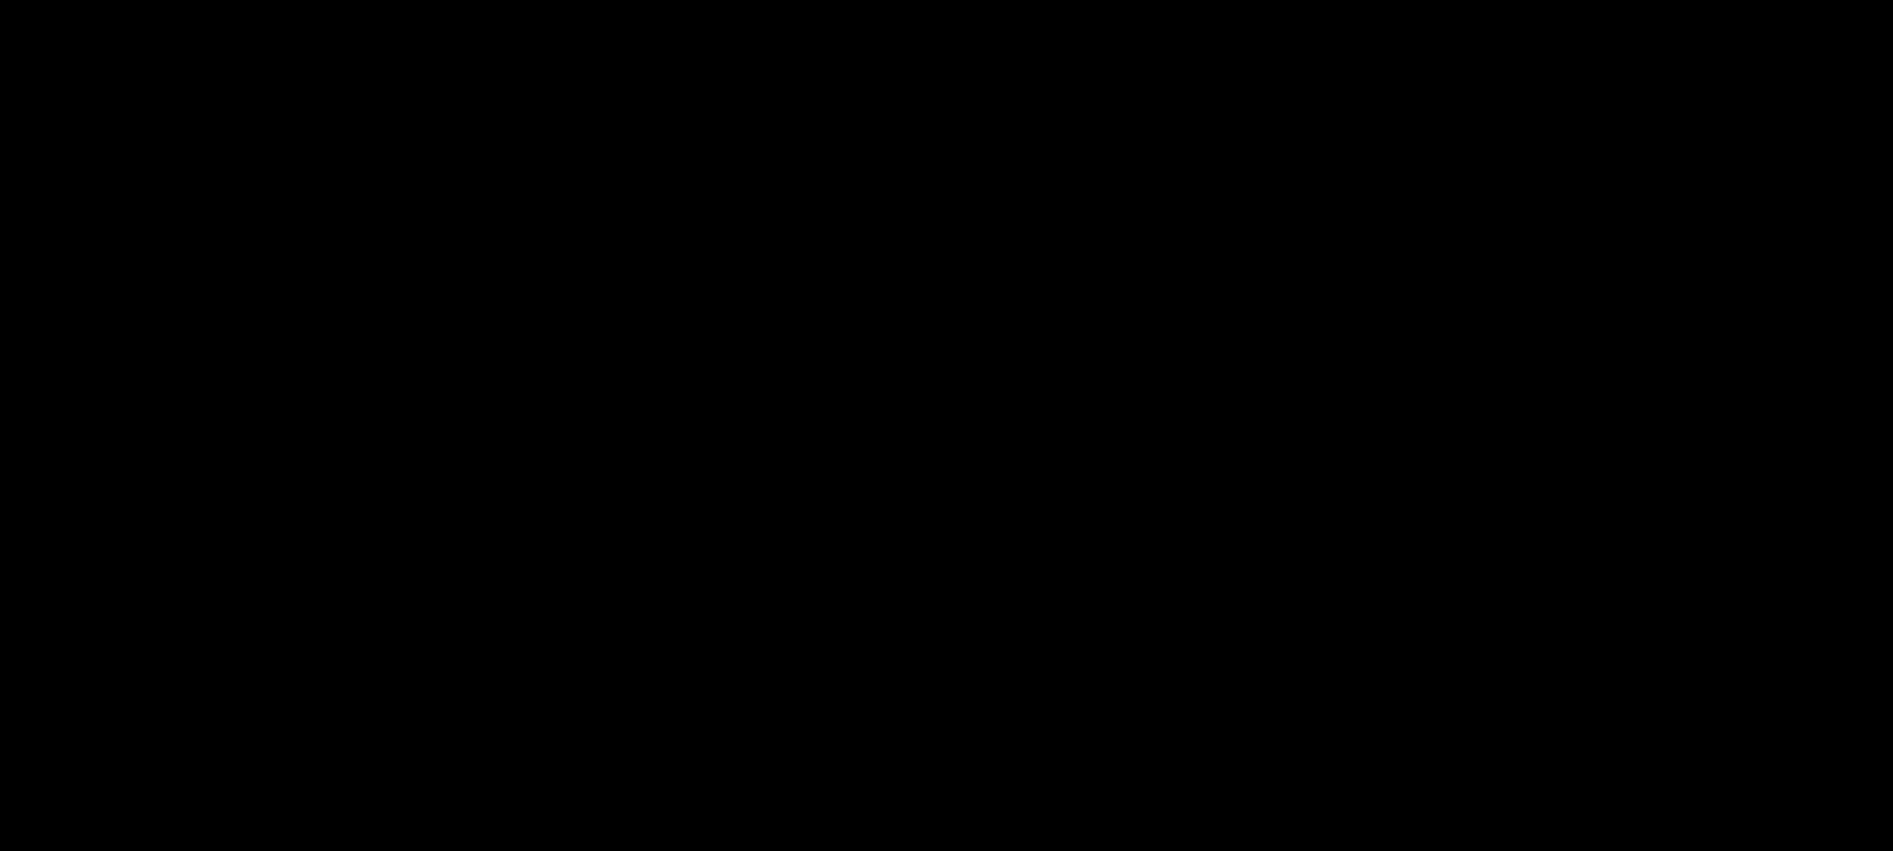 Illustrated Glossary Of Organic Chemistry Nmr Spectroscopy